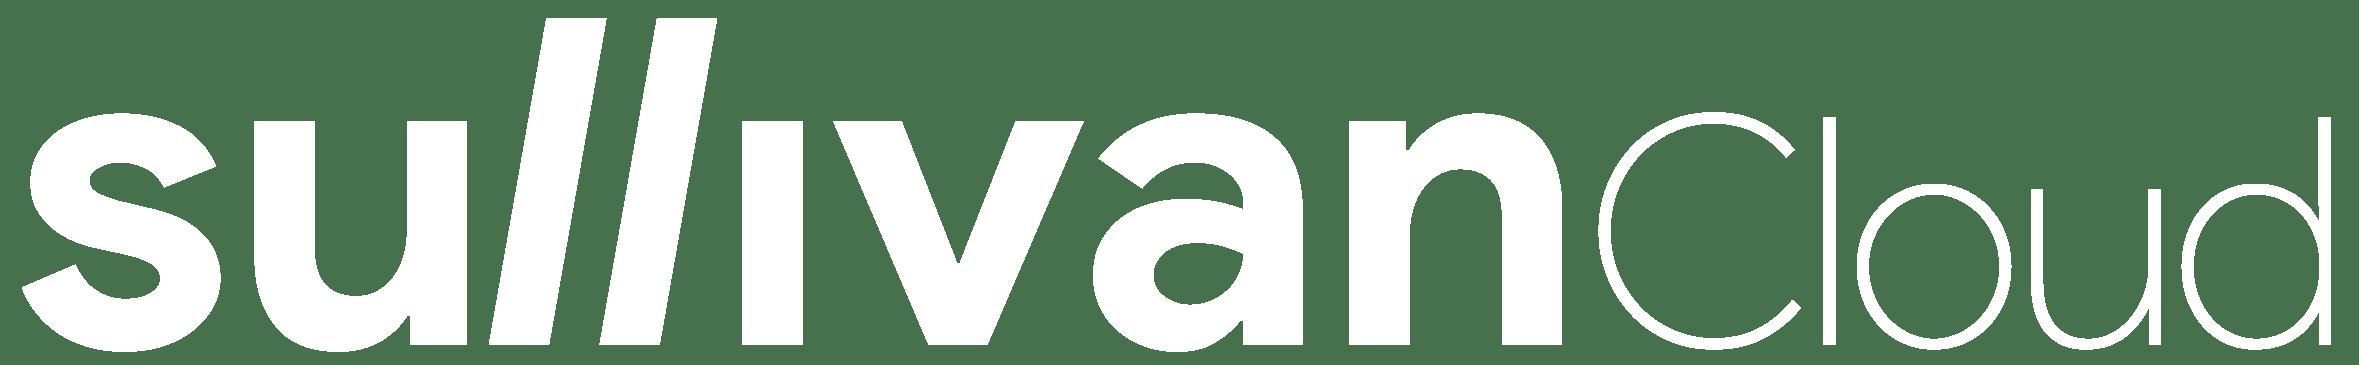 Logo Sullivan